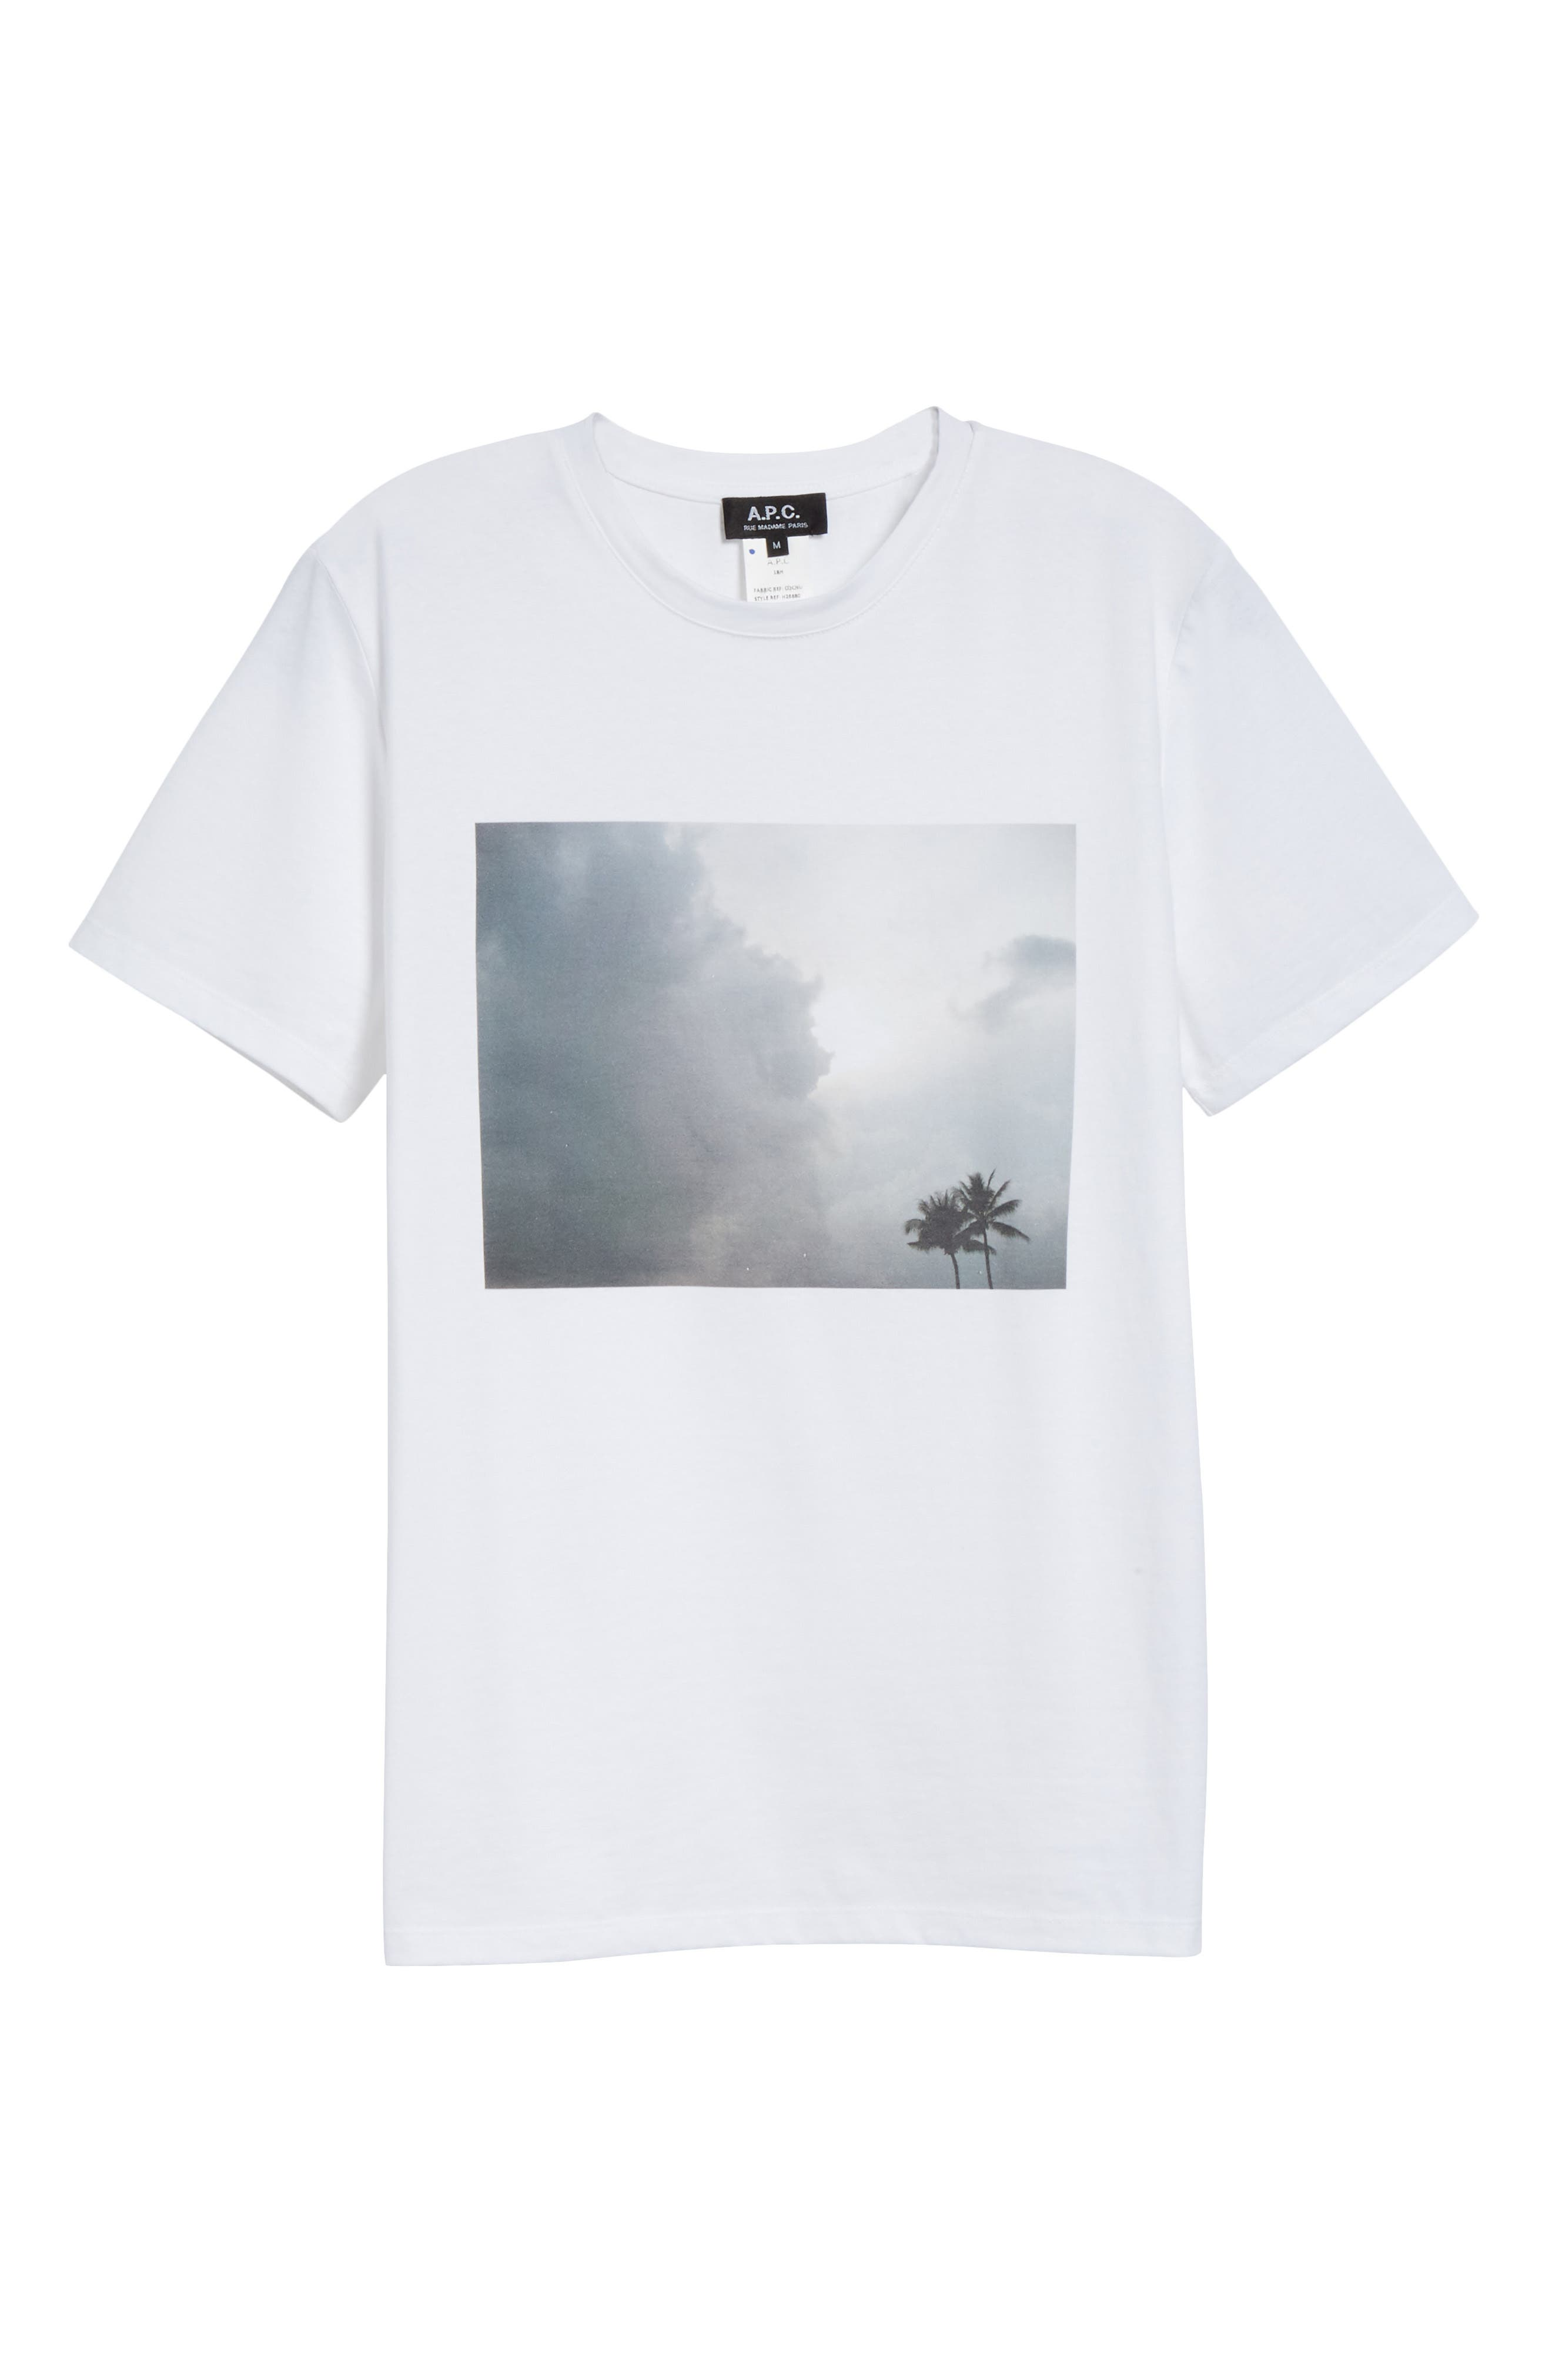 Tropicool Graphic T-Shirt,                             Alternate thumbnail 6, color,                             100